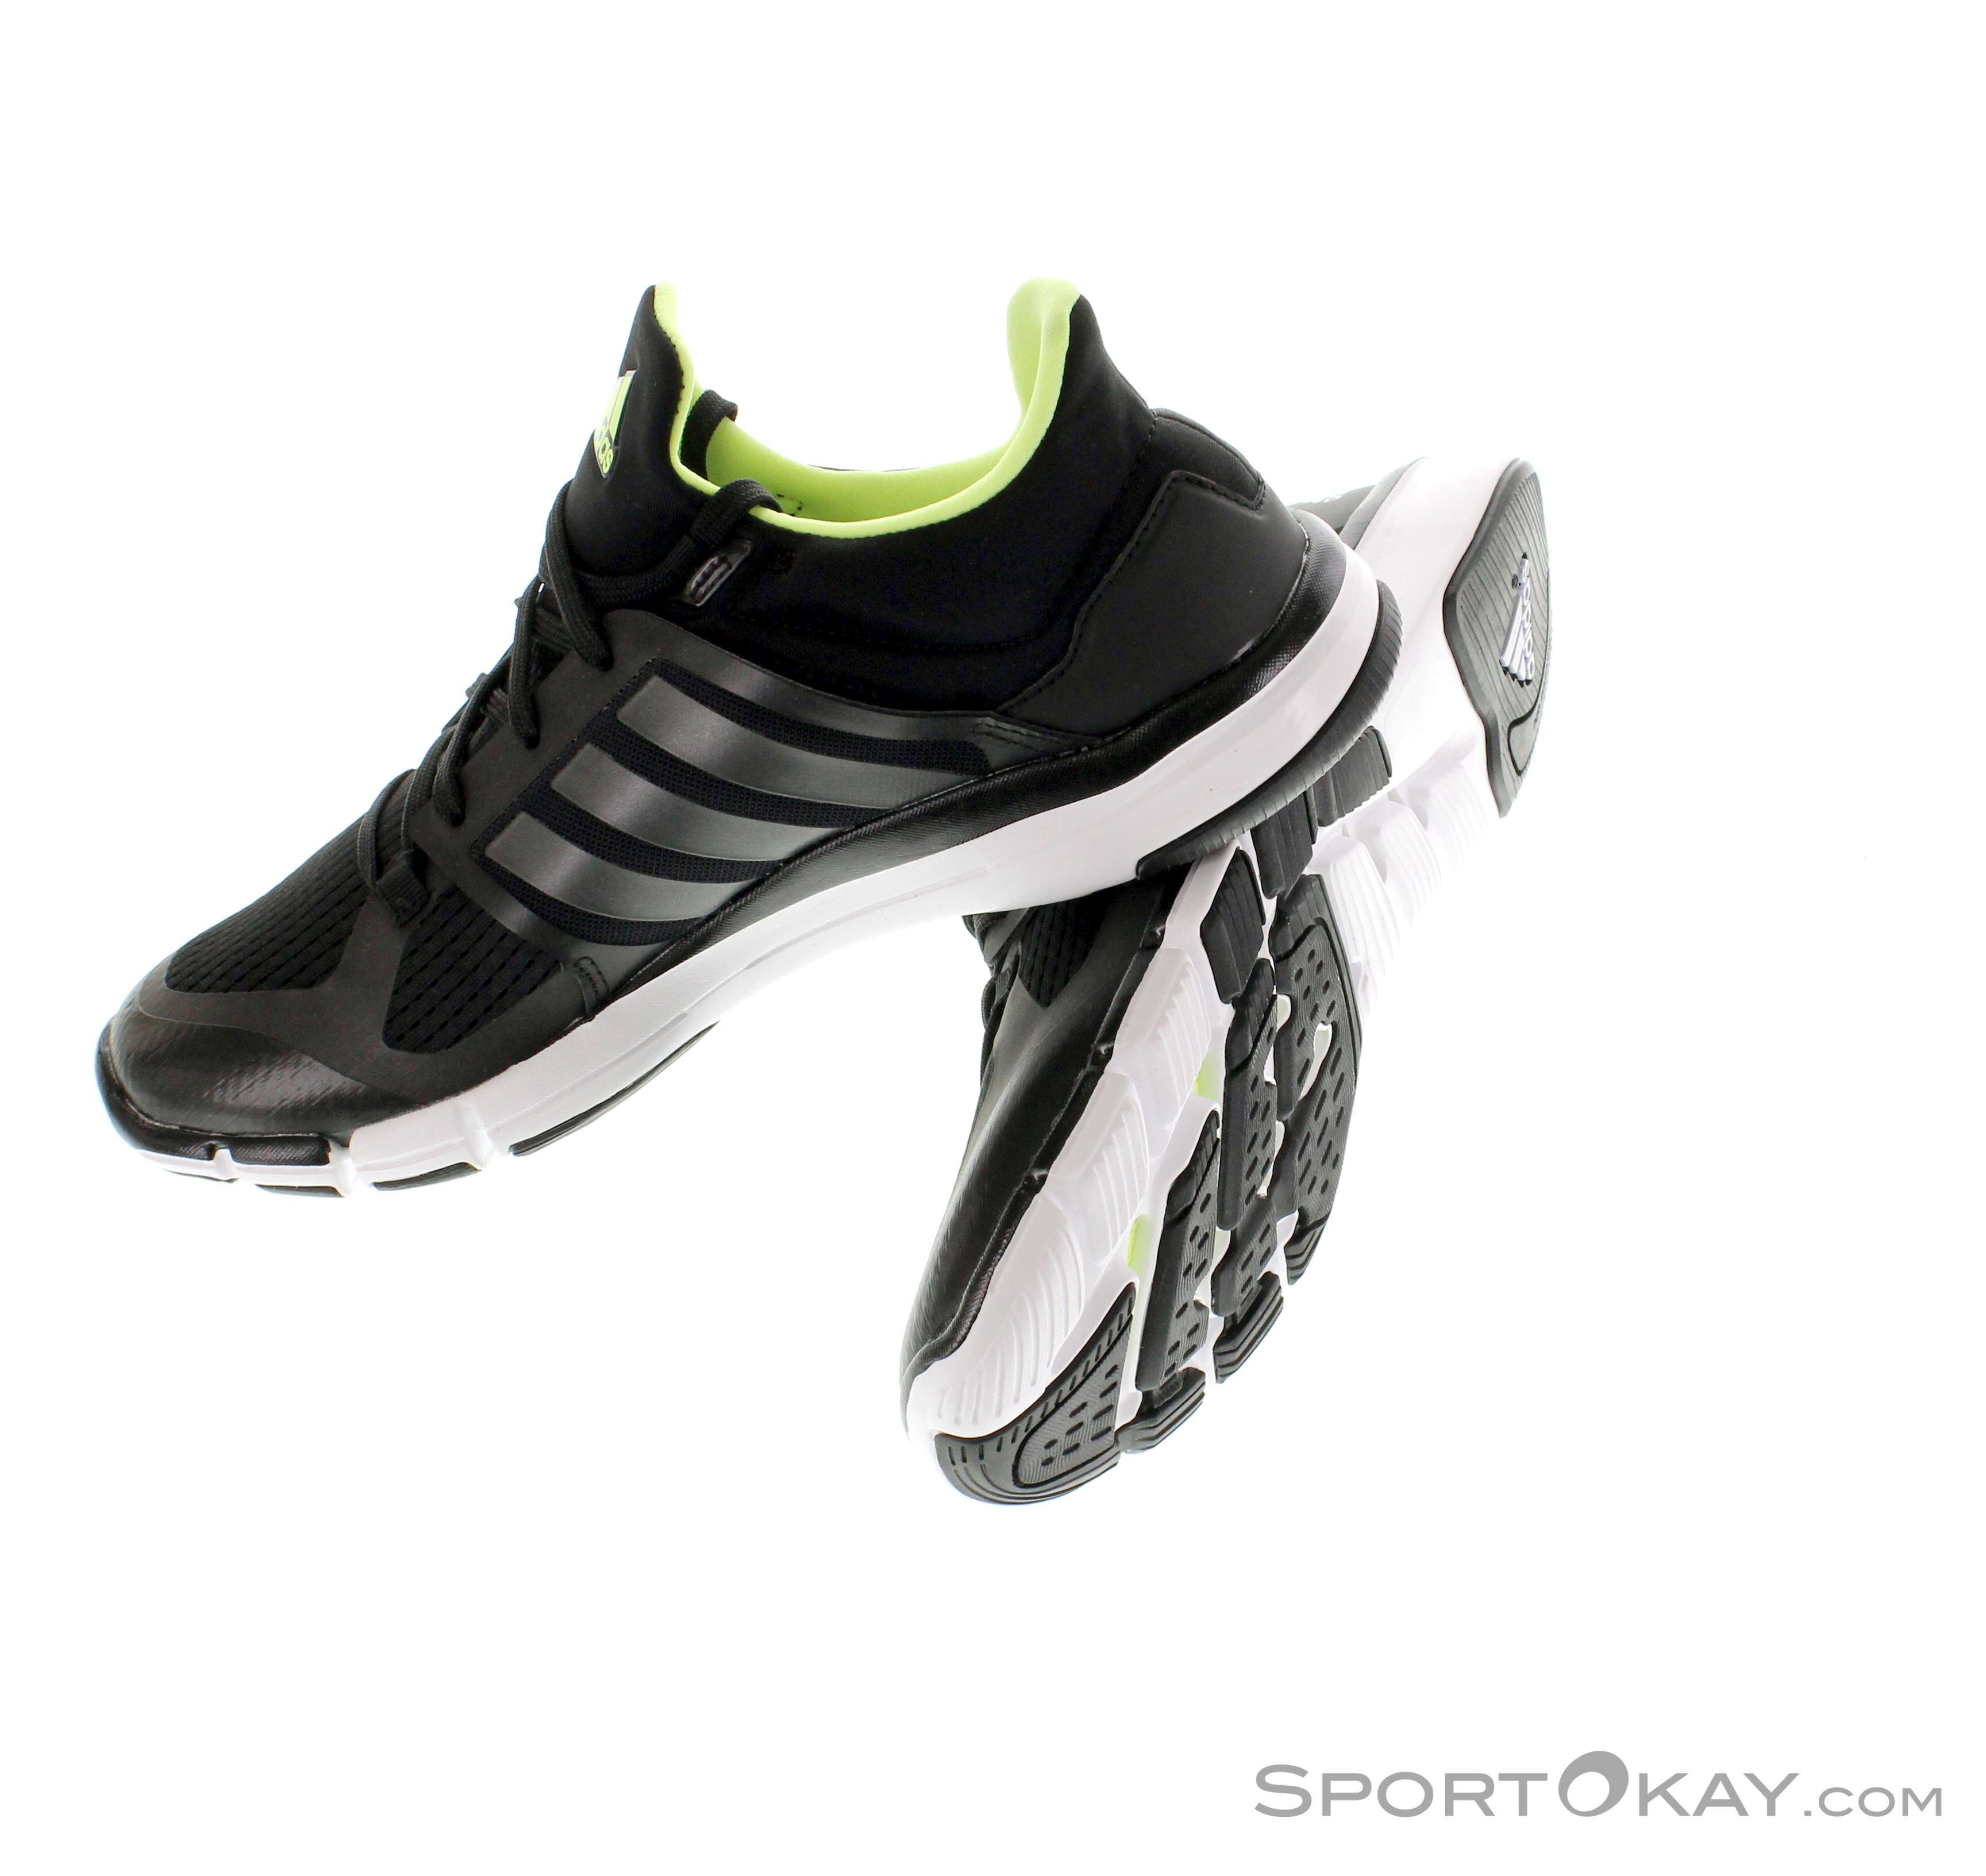 Adidas Adipure Fitness Schuhe 39 13